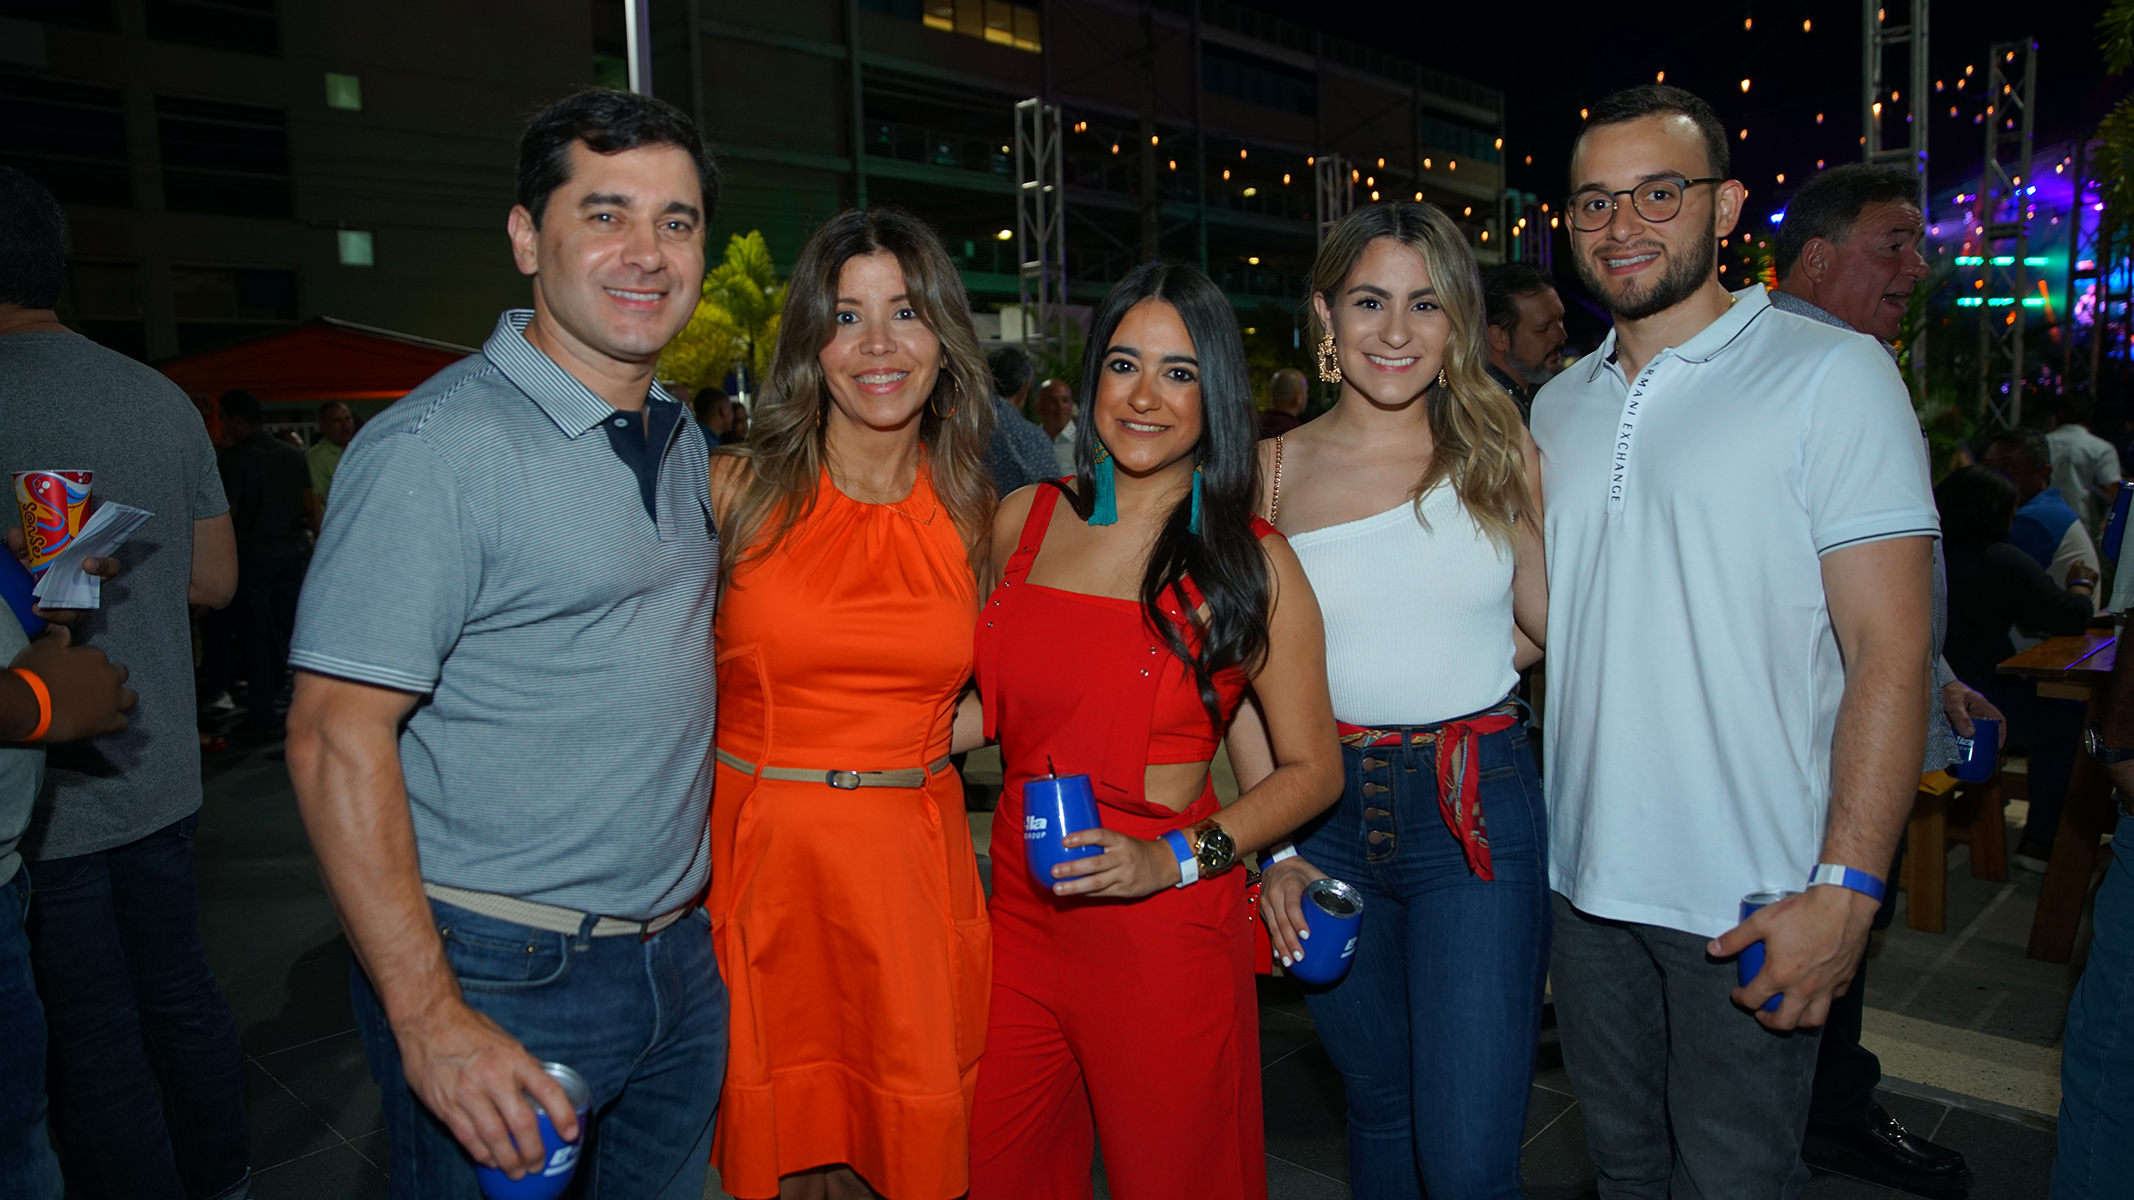 José Jaunarena, Priscila Vélez, Cristina Vega, Tanya Nieves y José González. Suministrada